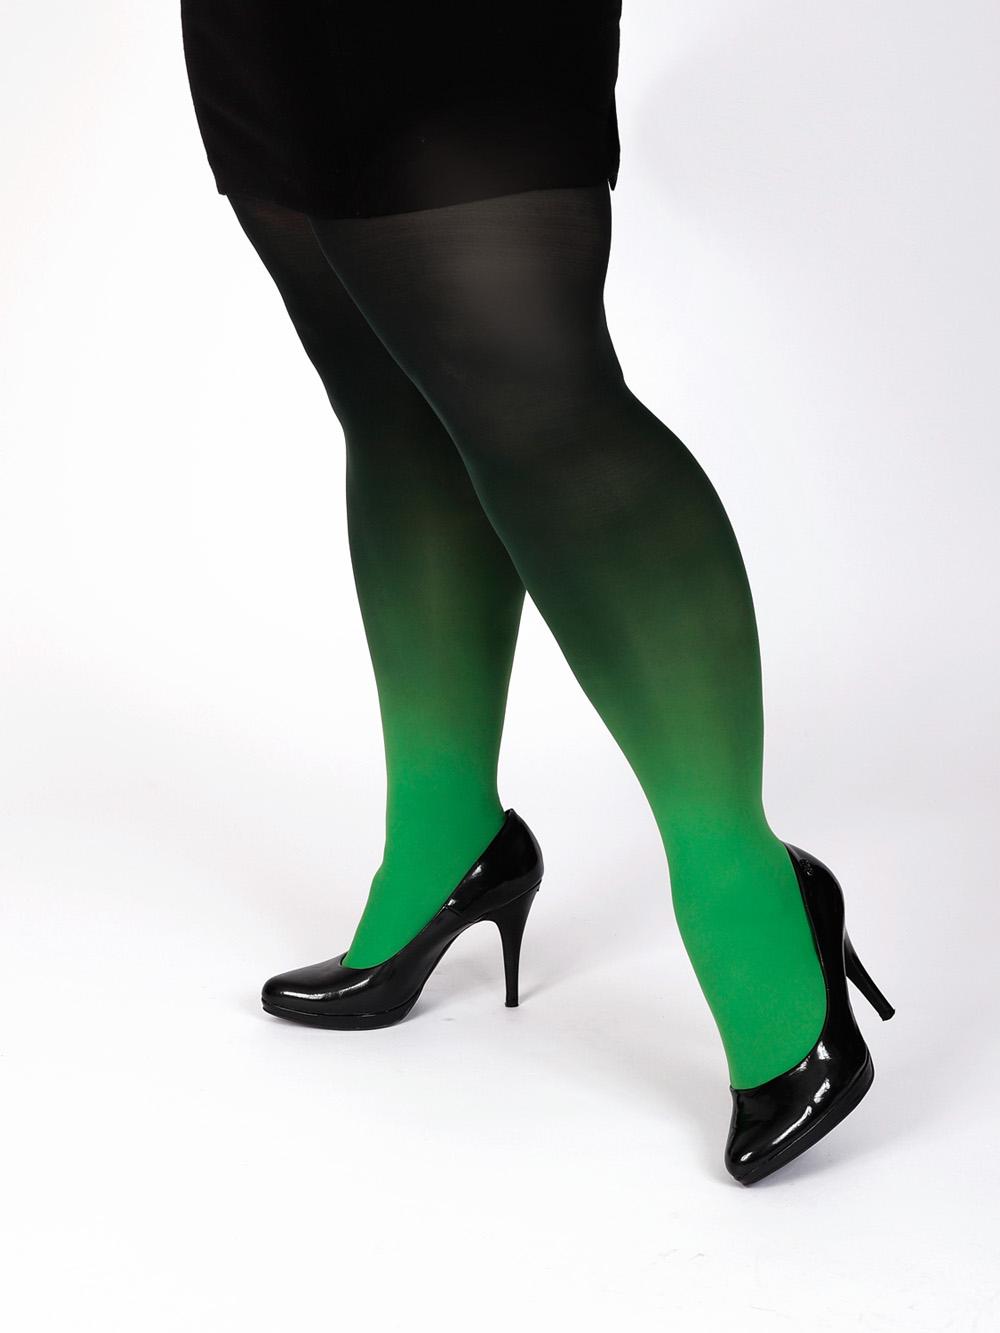 Plus Size Grün-schwarz Strumpfhose